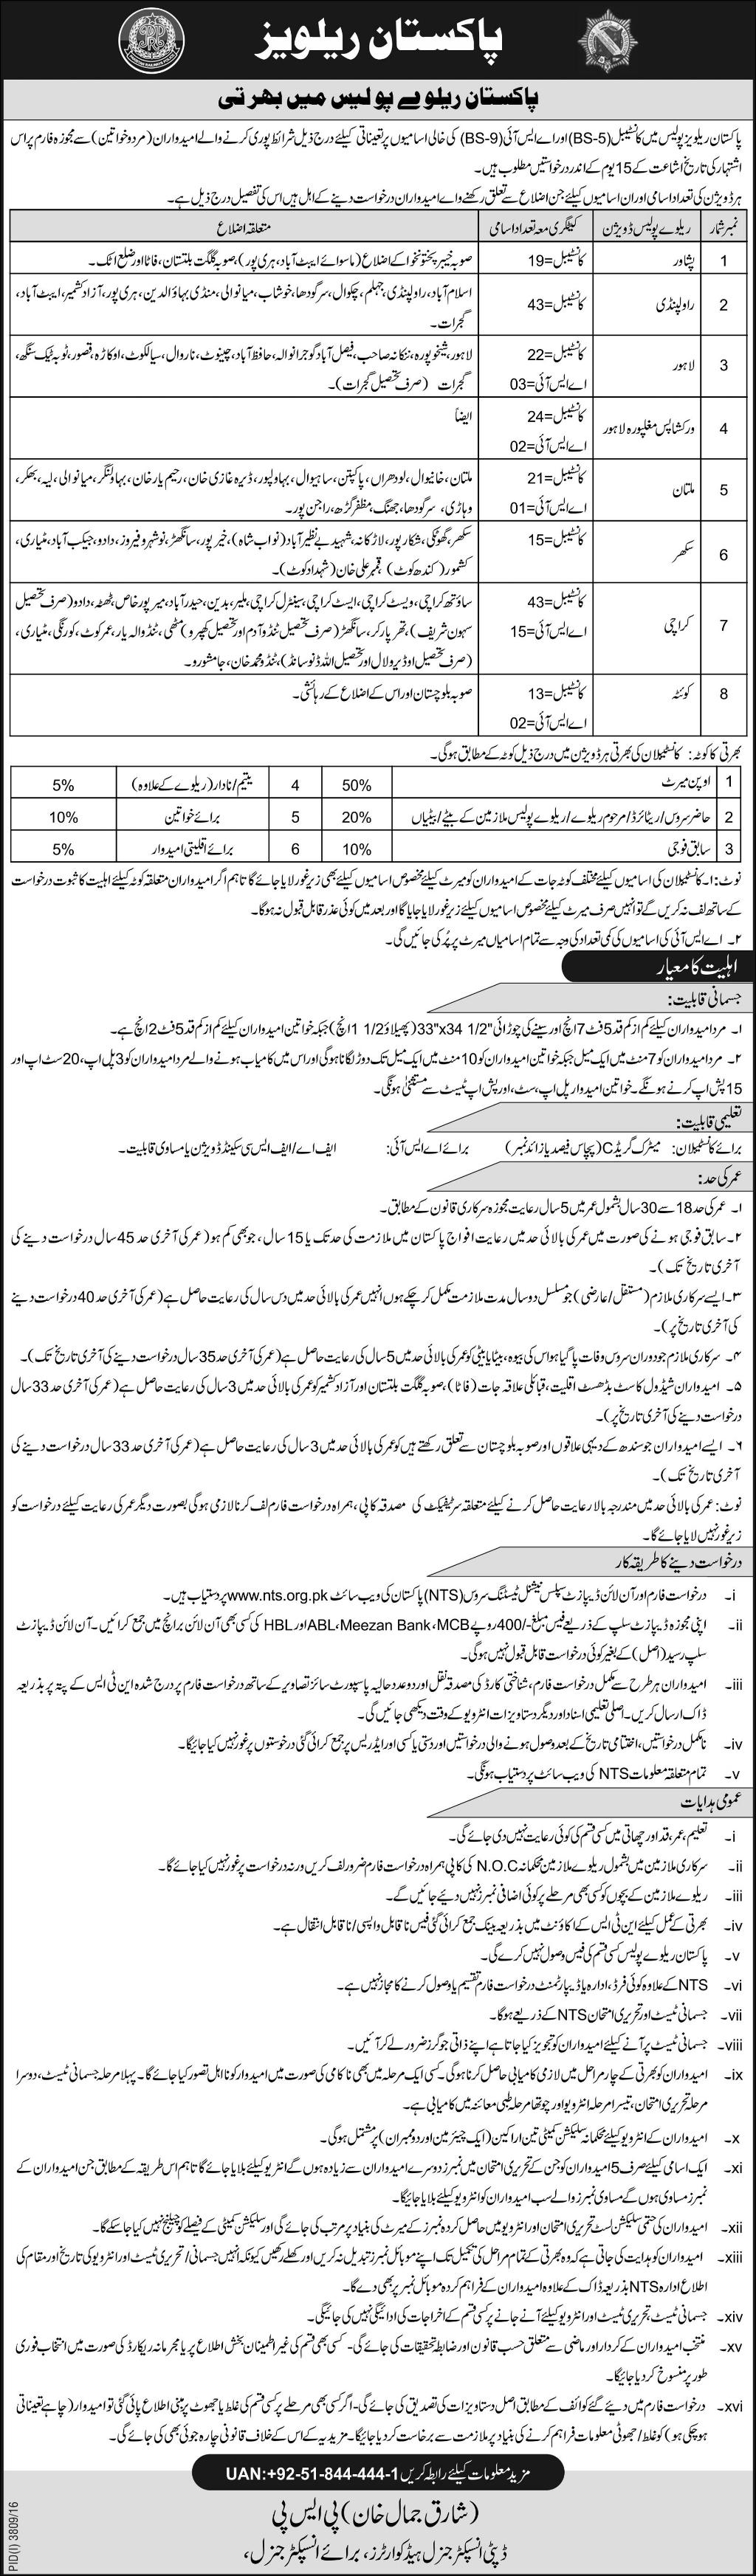 Pakistan Railway Police Jobs 2017 ASI Application Form